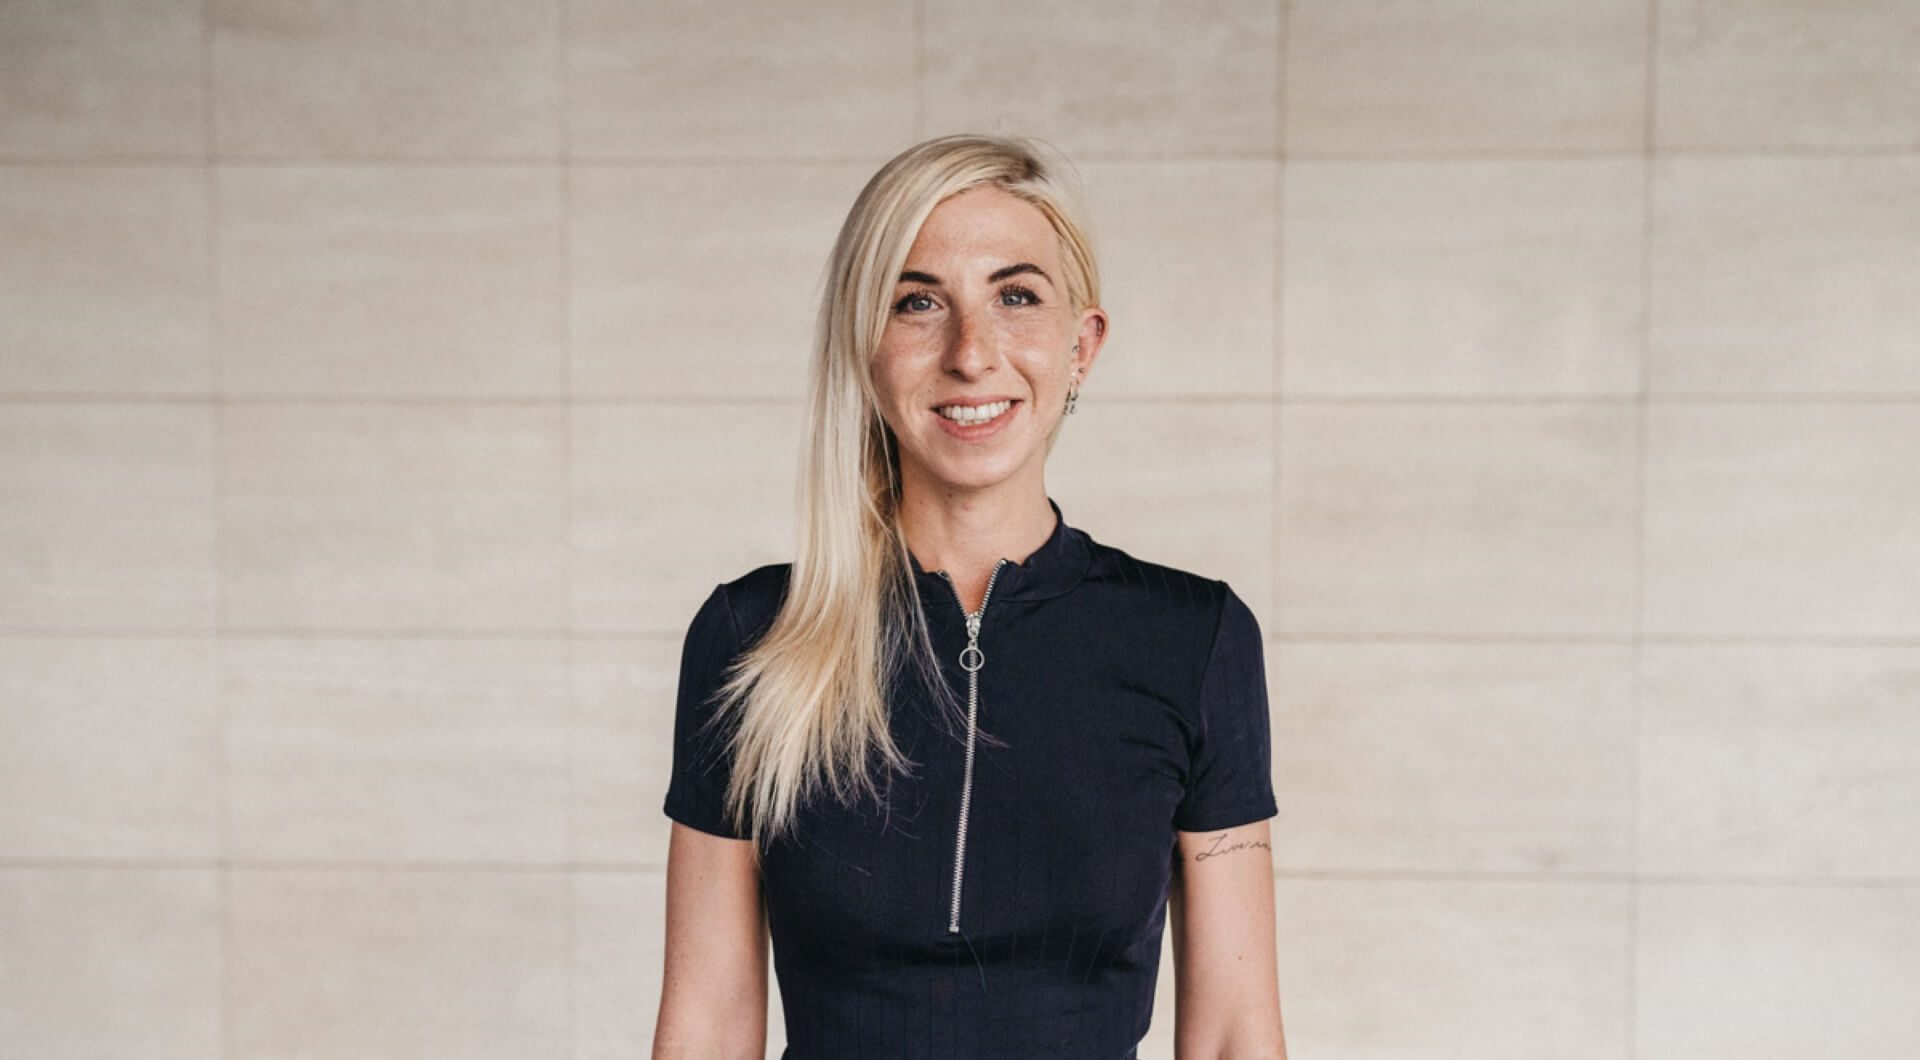 Ines Schvartzman fundadora y directora headhunter de OneTalent